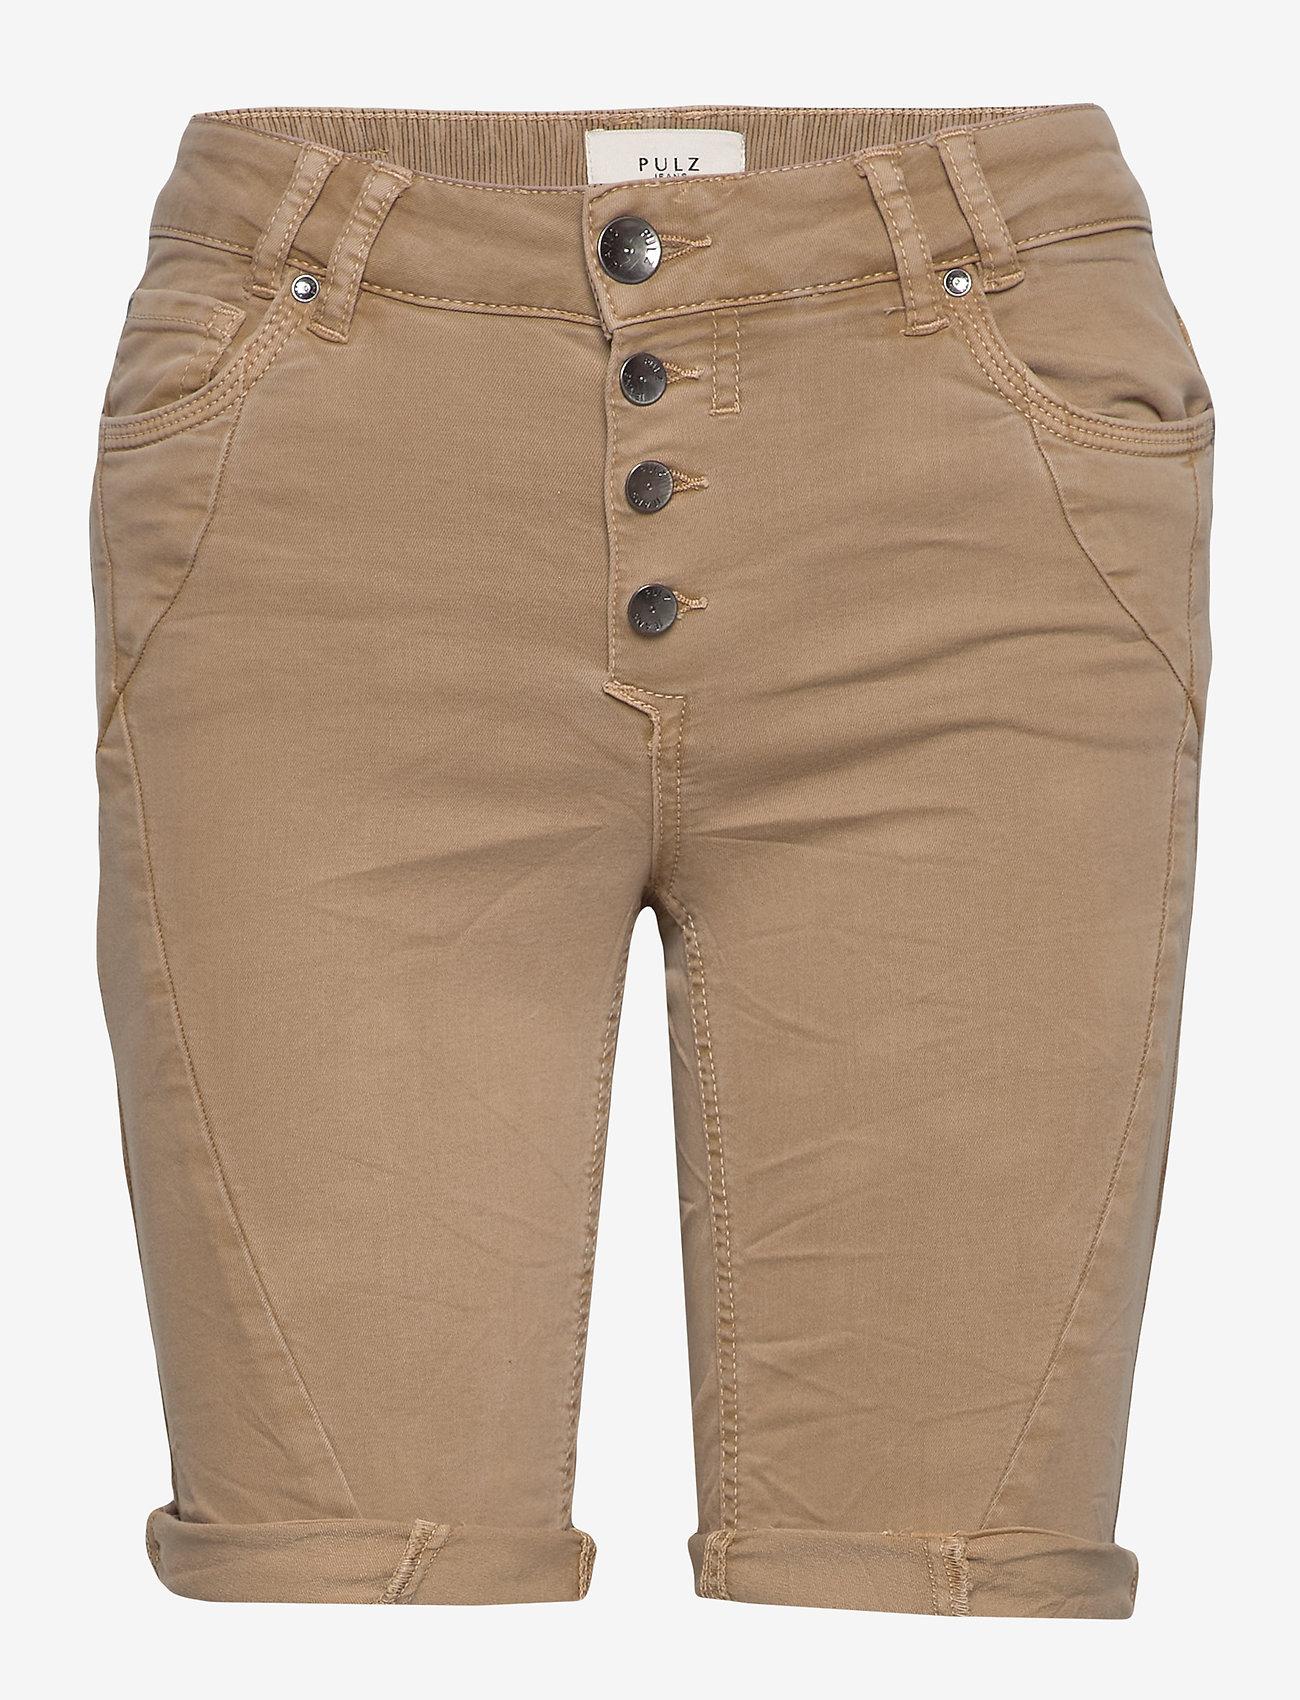 Pulz Jeans - PZROSITA Shorts - denimshorts - tannin - 0